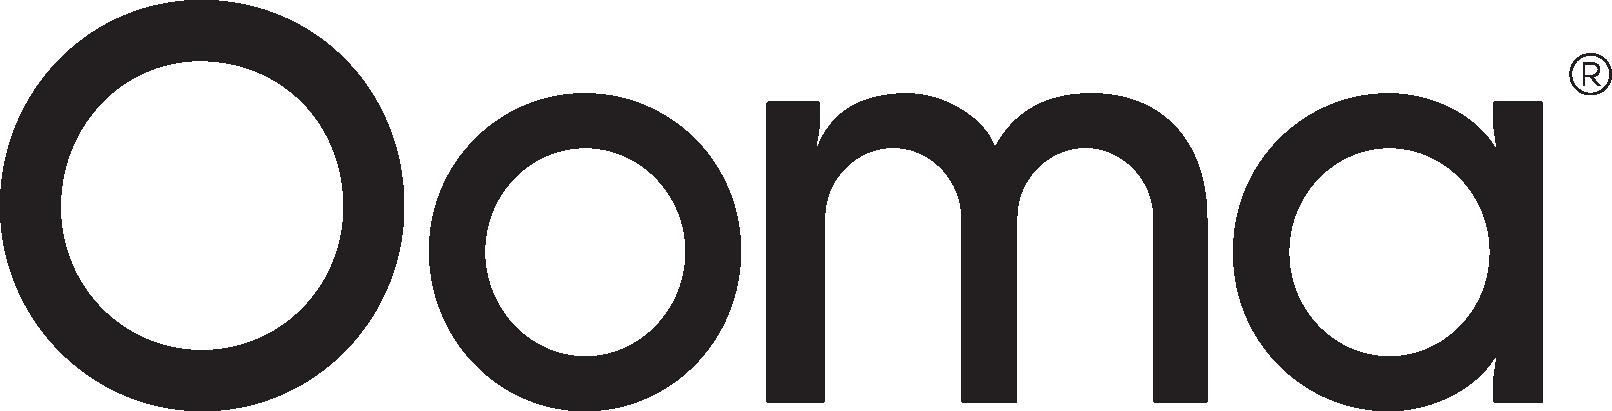 Hole Sponsors - Ooma - Logo